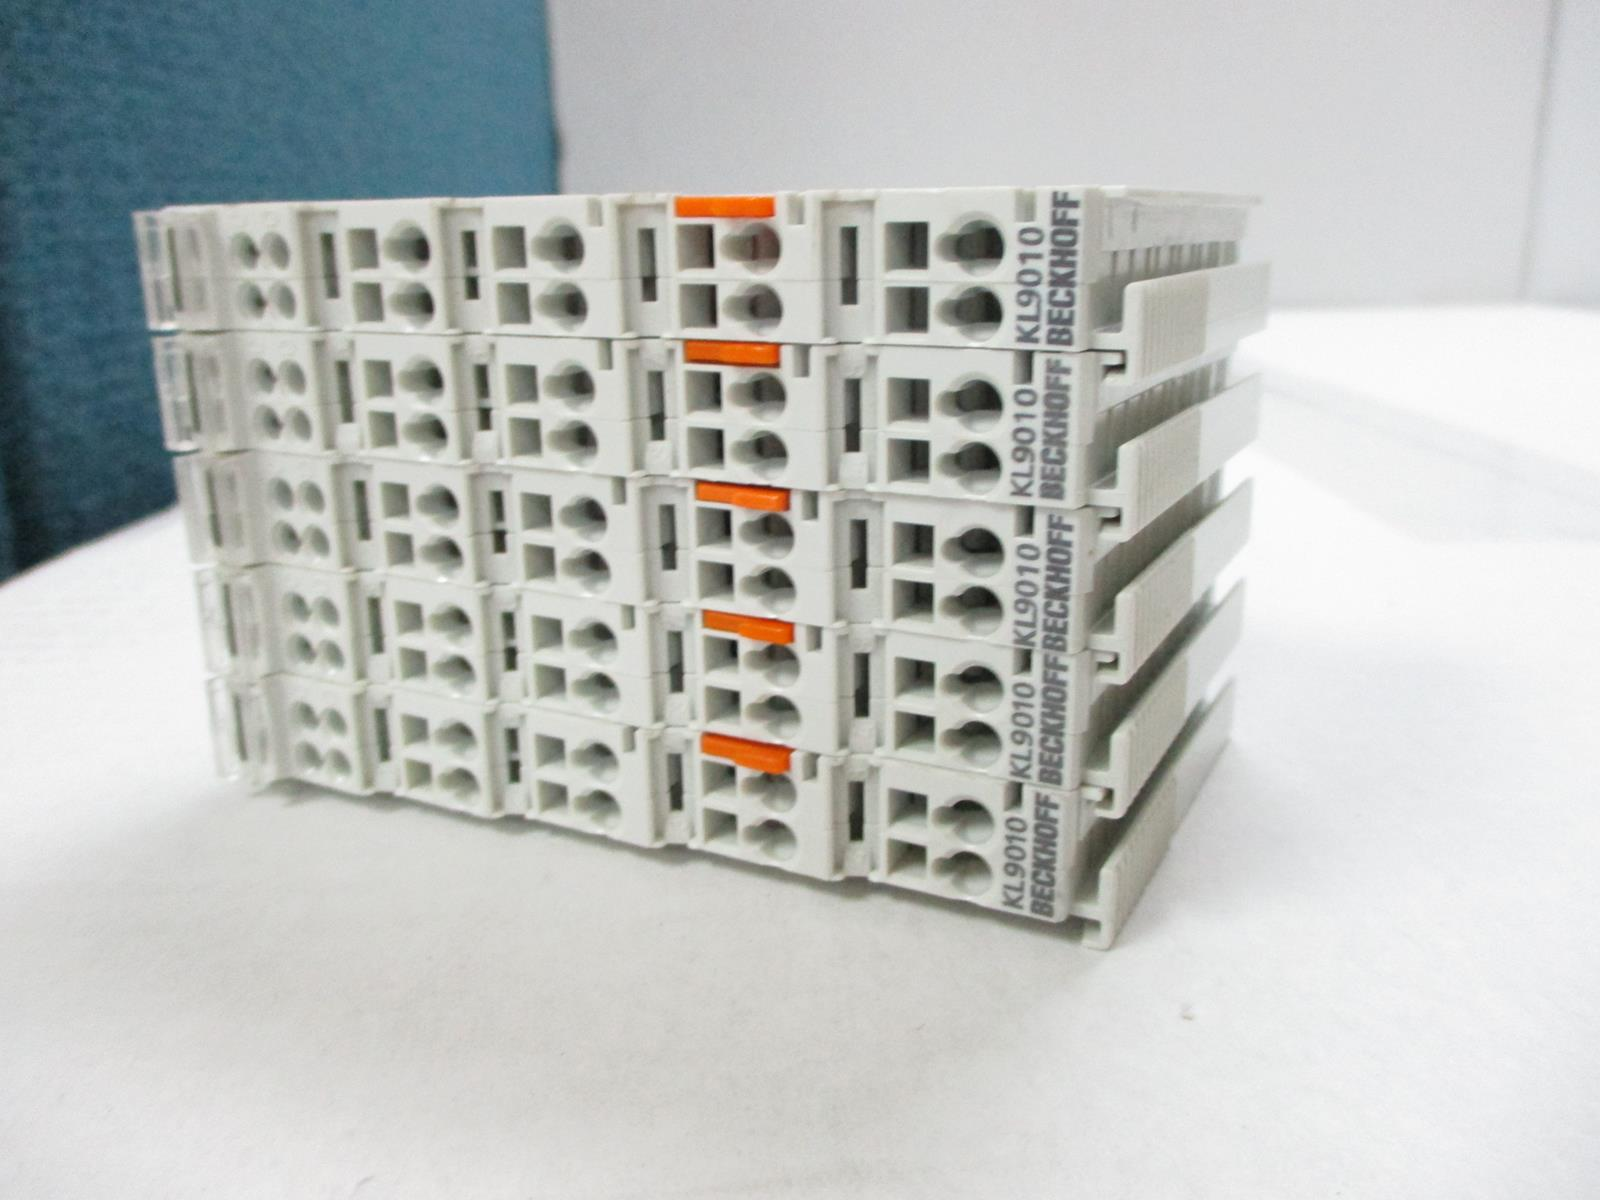 5Pcs NC SPST Einrastfunktion Not-Aus-Druckschalter 10A 600V I3X7 U6O3